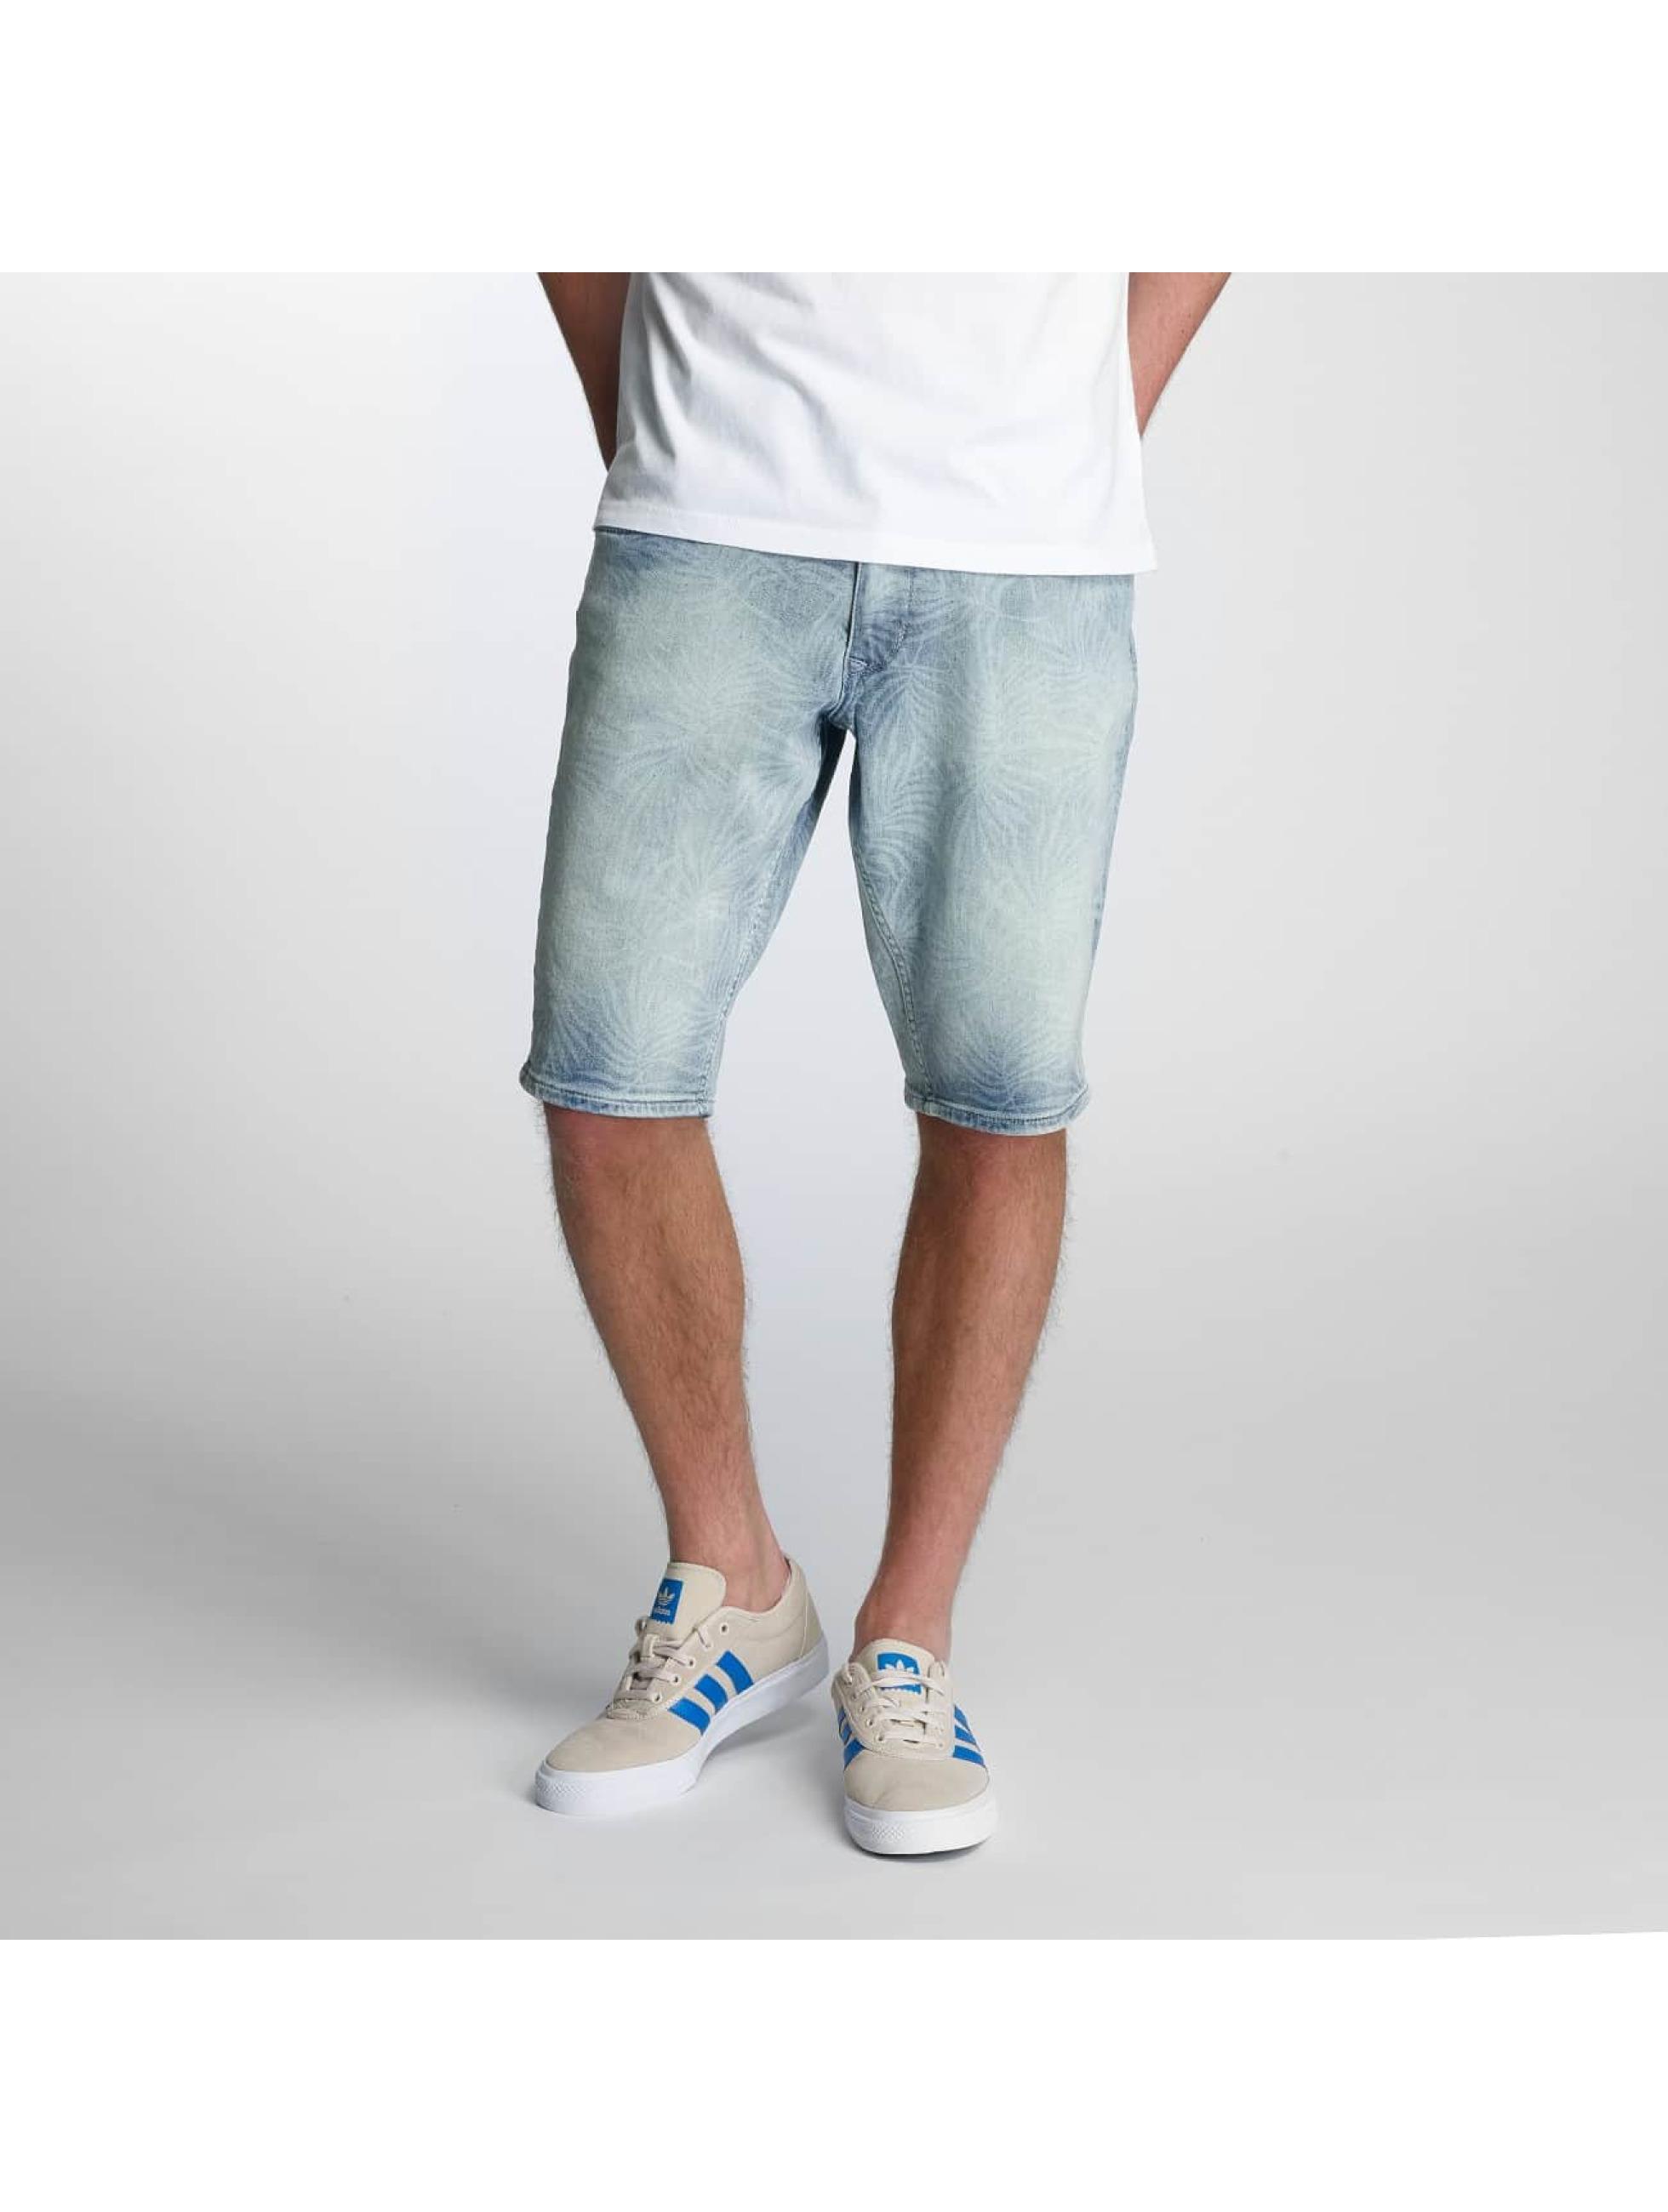 Petrol Industries Männer Shorts Jeans in indigo Sale Angebote Laubsdorf